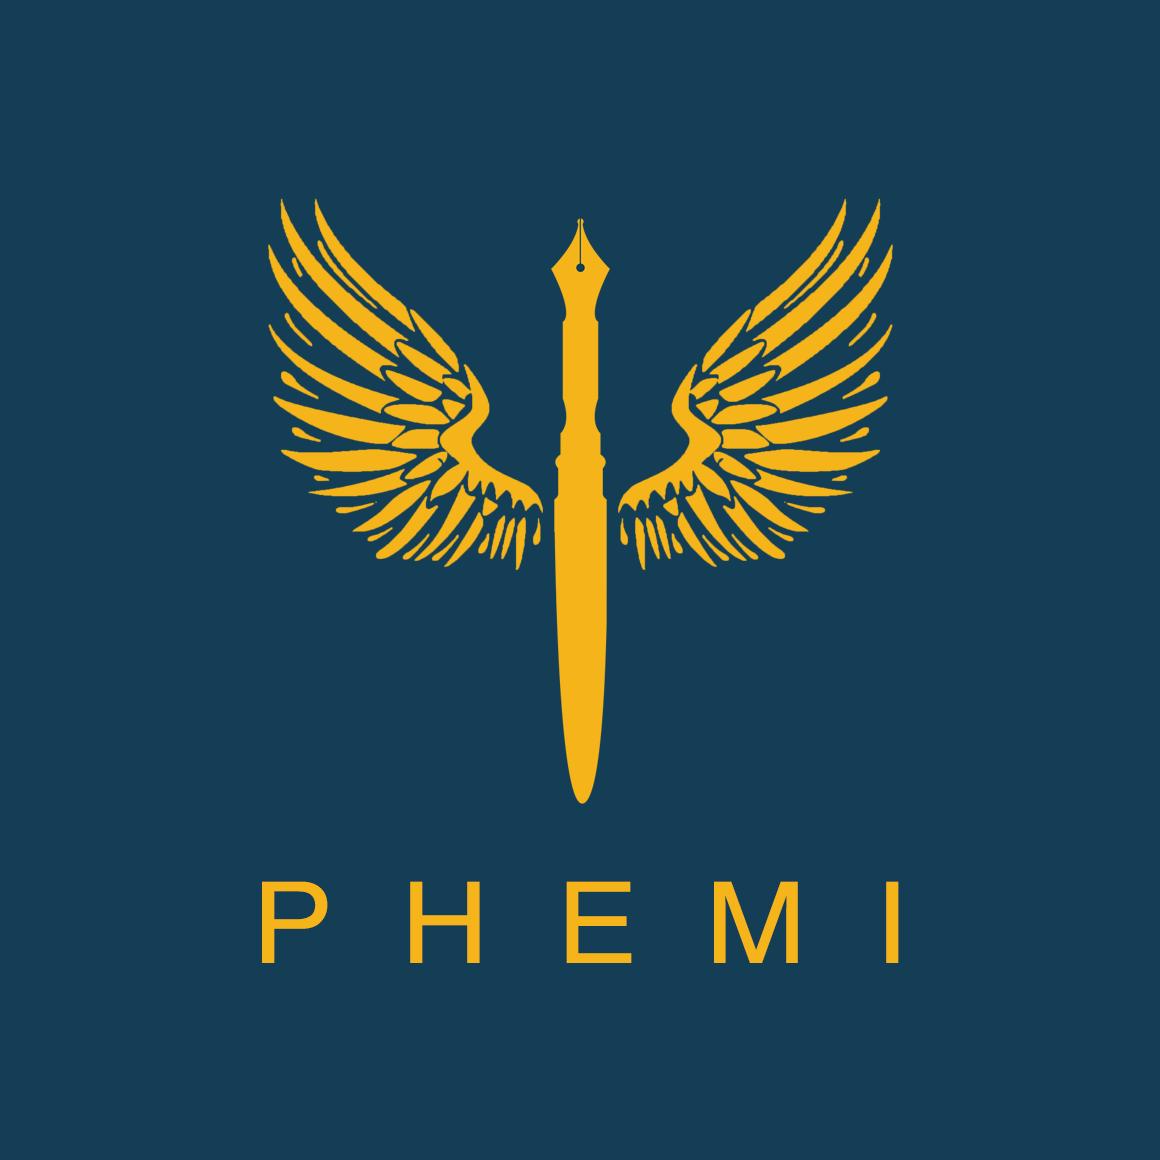 The Phemi logo